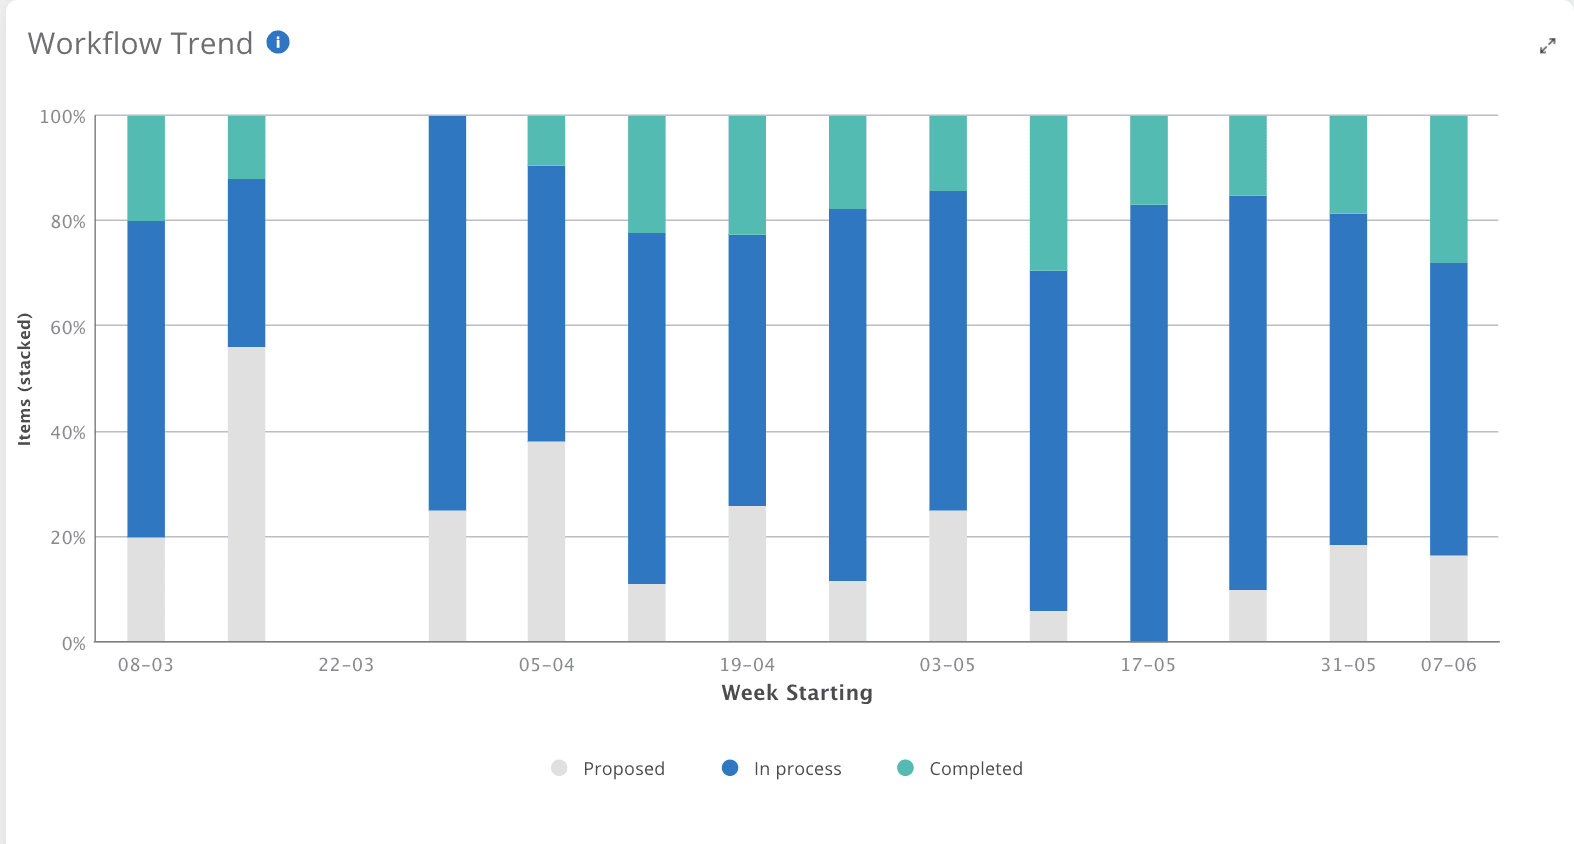 Workflow trend analysis